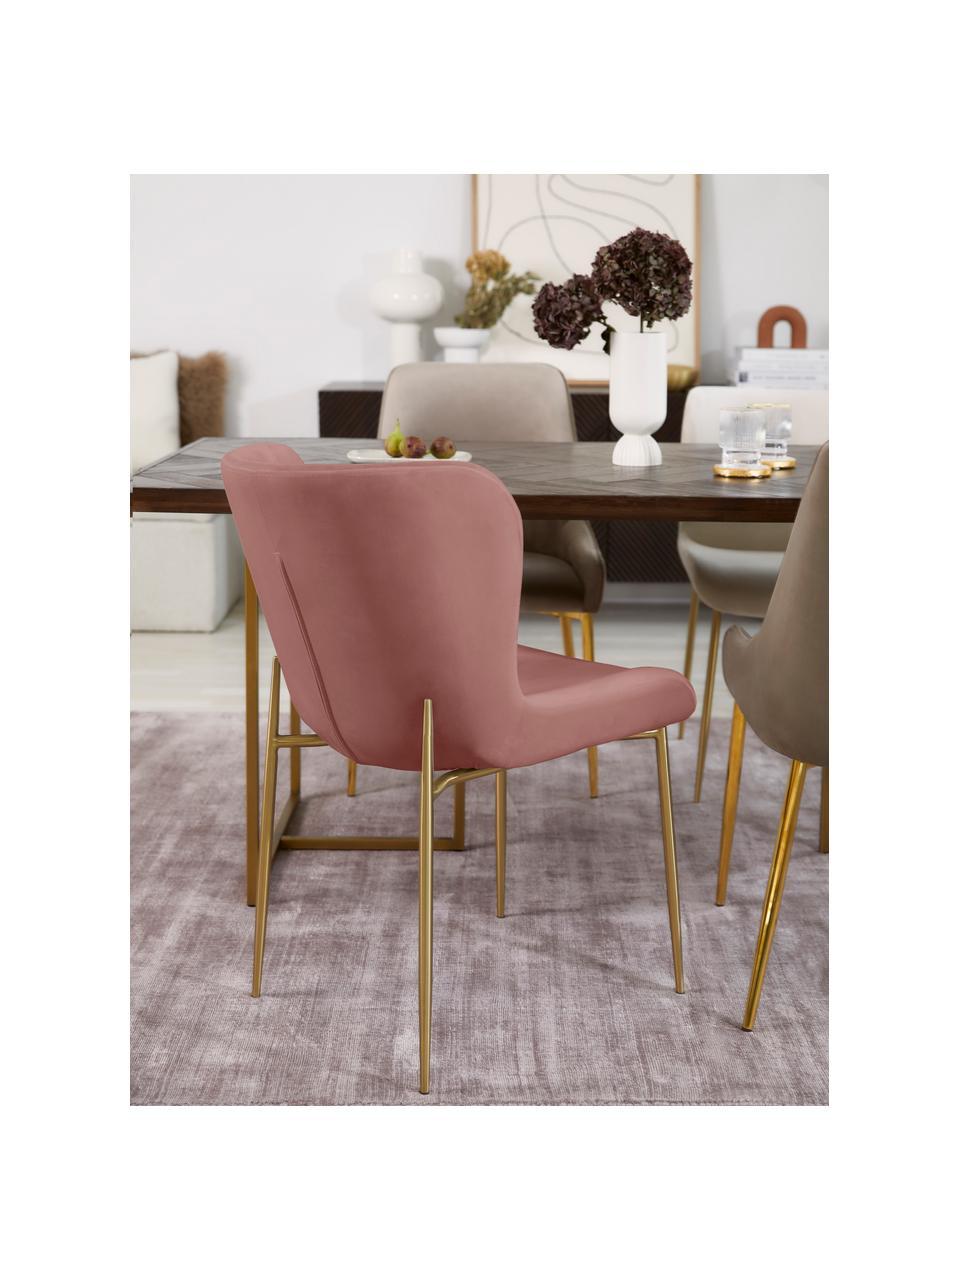 Fluwelen stoel Tess in oudroze, Bekleding: fluweel (polyester), Poten: gecoat metaal, Fluweel oudroze, poten goudkleurig, B 49 x D 64 cm